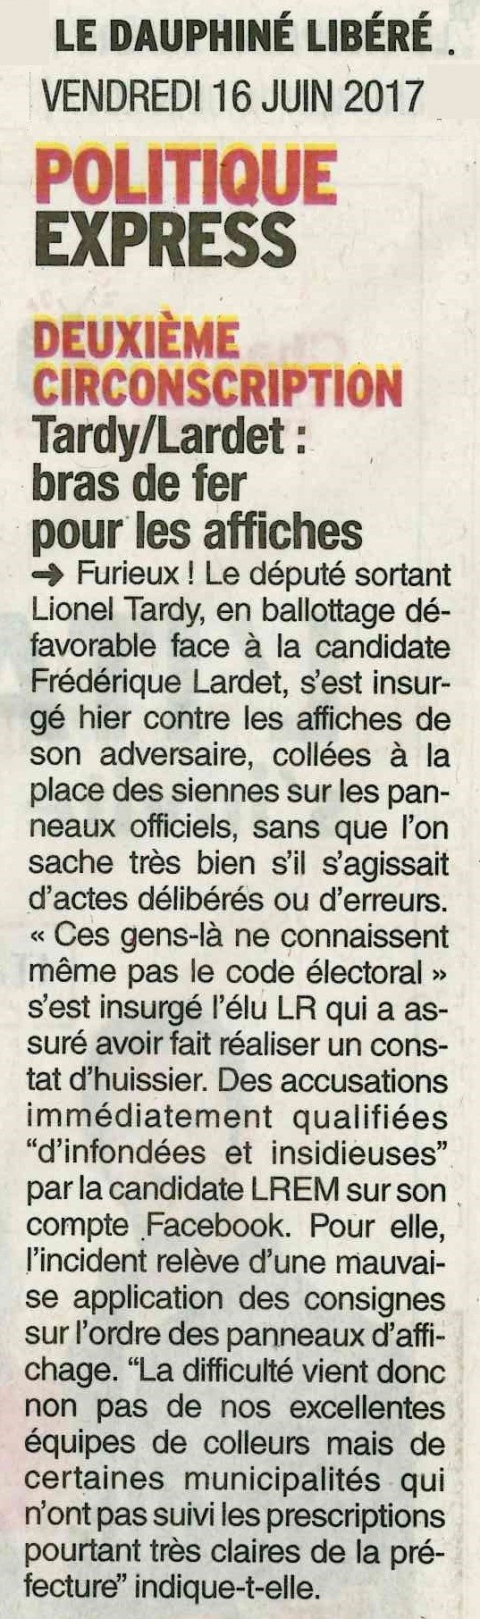 dauphine,tardy,lardet,presse,election,legislatives 2017